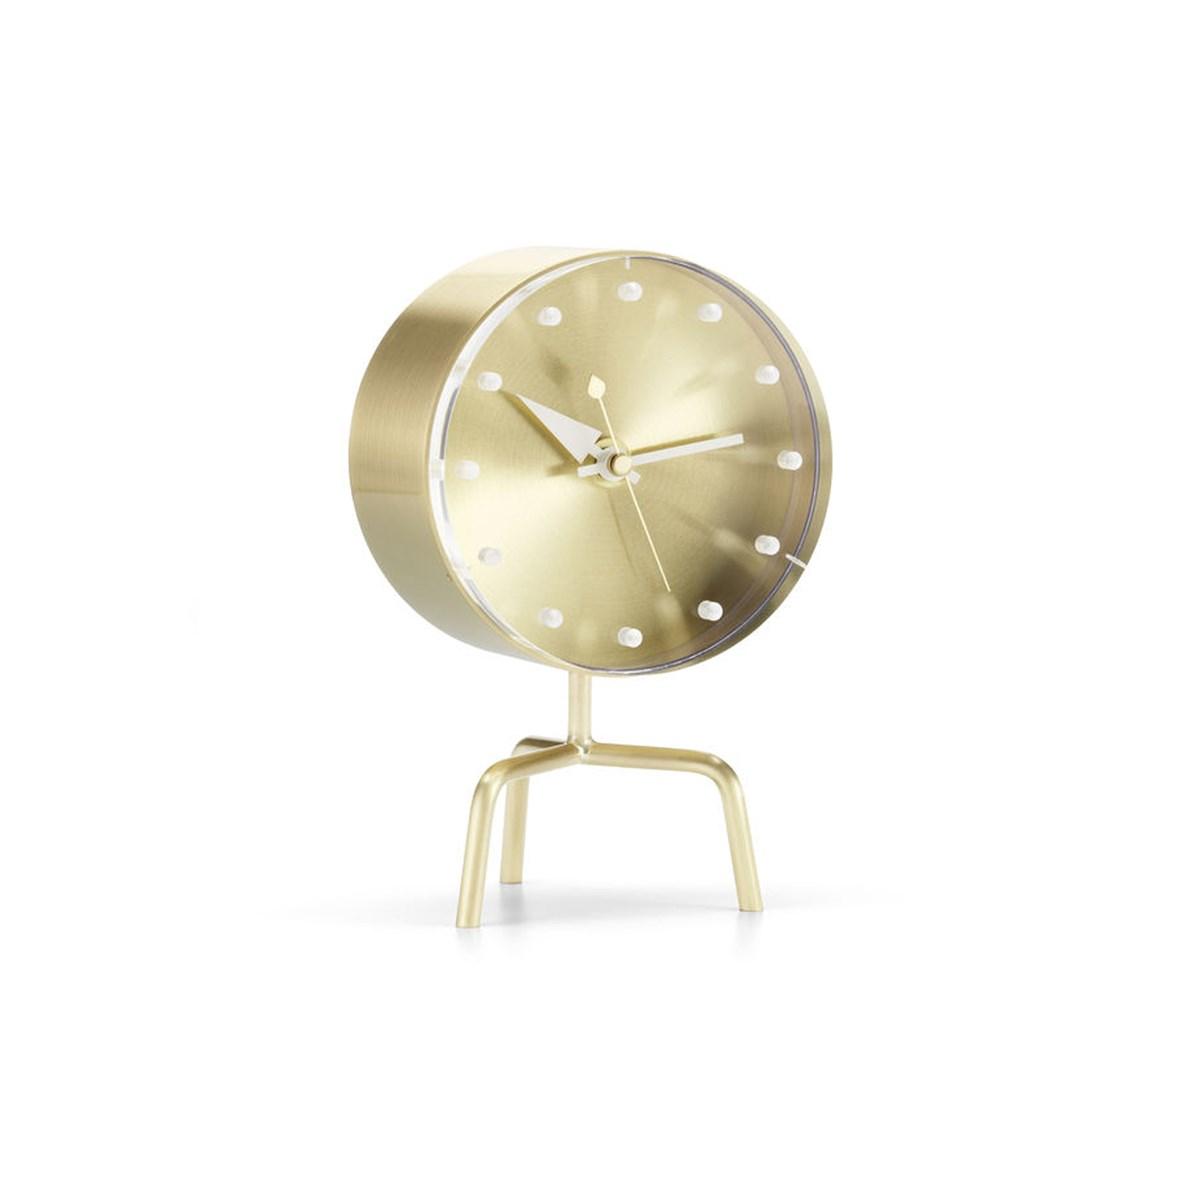 Vitra-George-Nelson-Tripod-Wall-Clock-Matisse-1